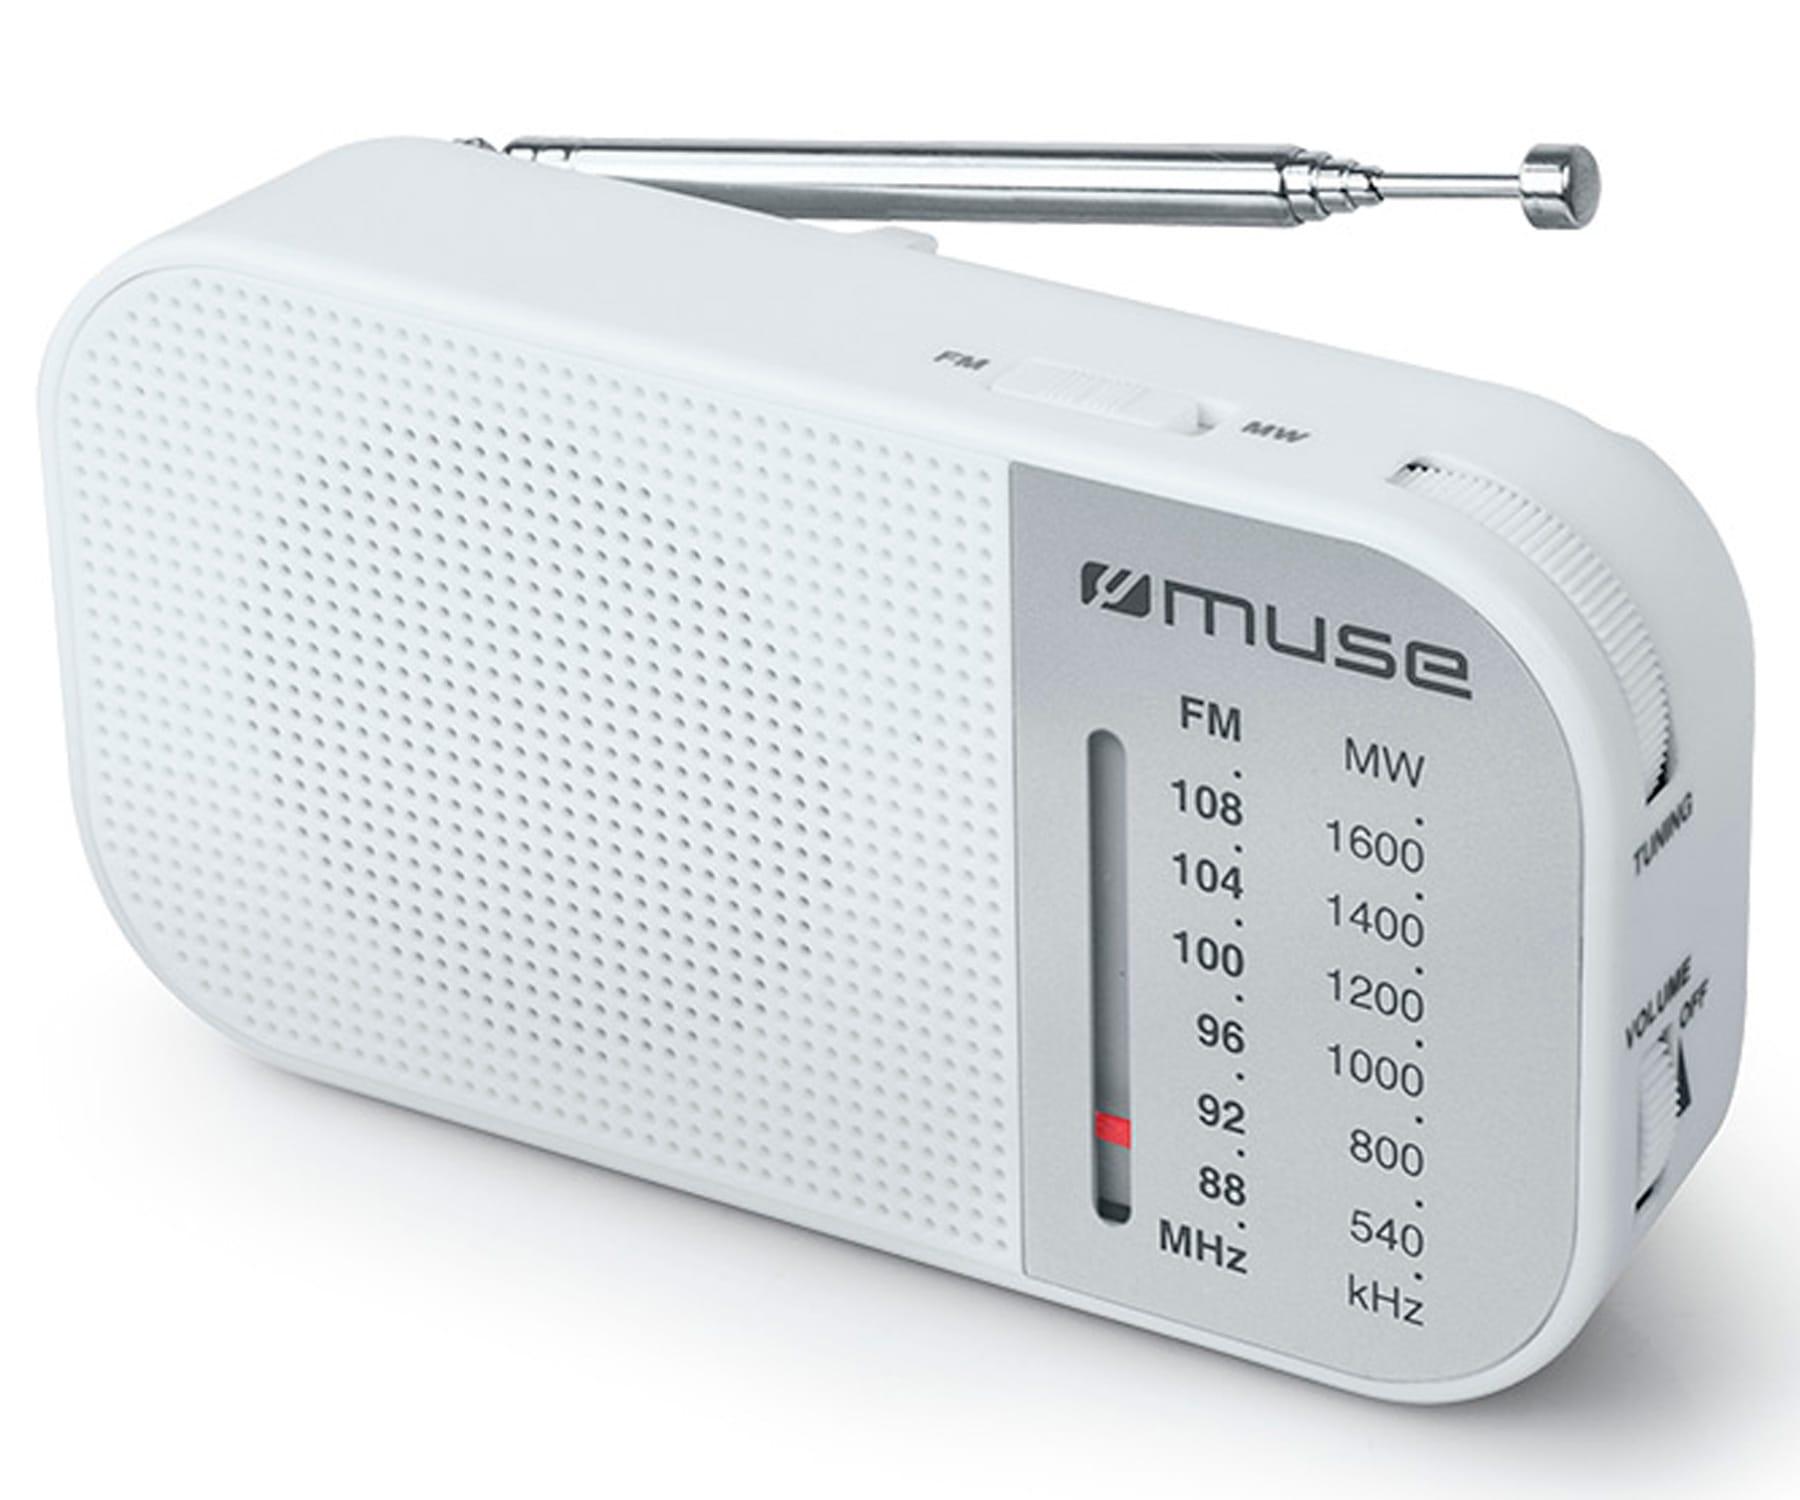 MUSE M-025 RW BLANCO RADIO ANALÓGICA AM/FM PORTÁTIL CON ALTAVOZ INTEGRADO